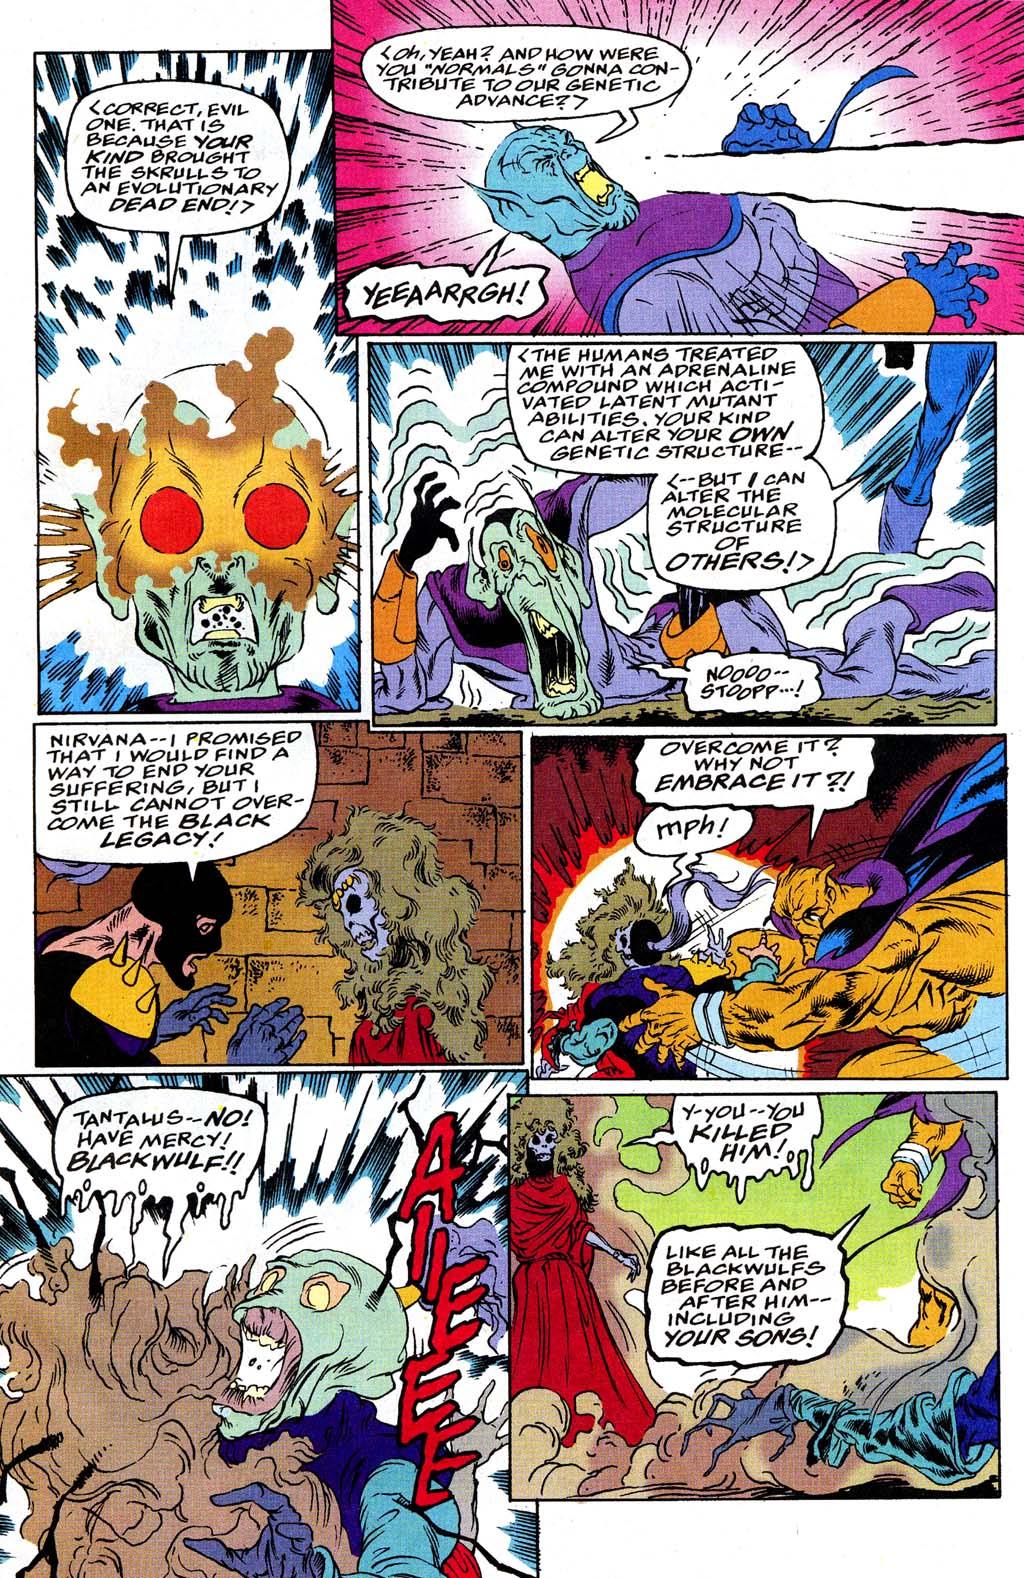 Read online Blackwulf comic -  Issue #10 - 9